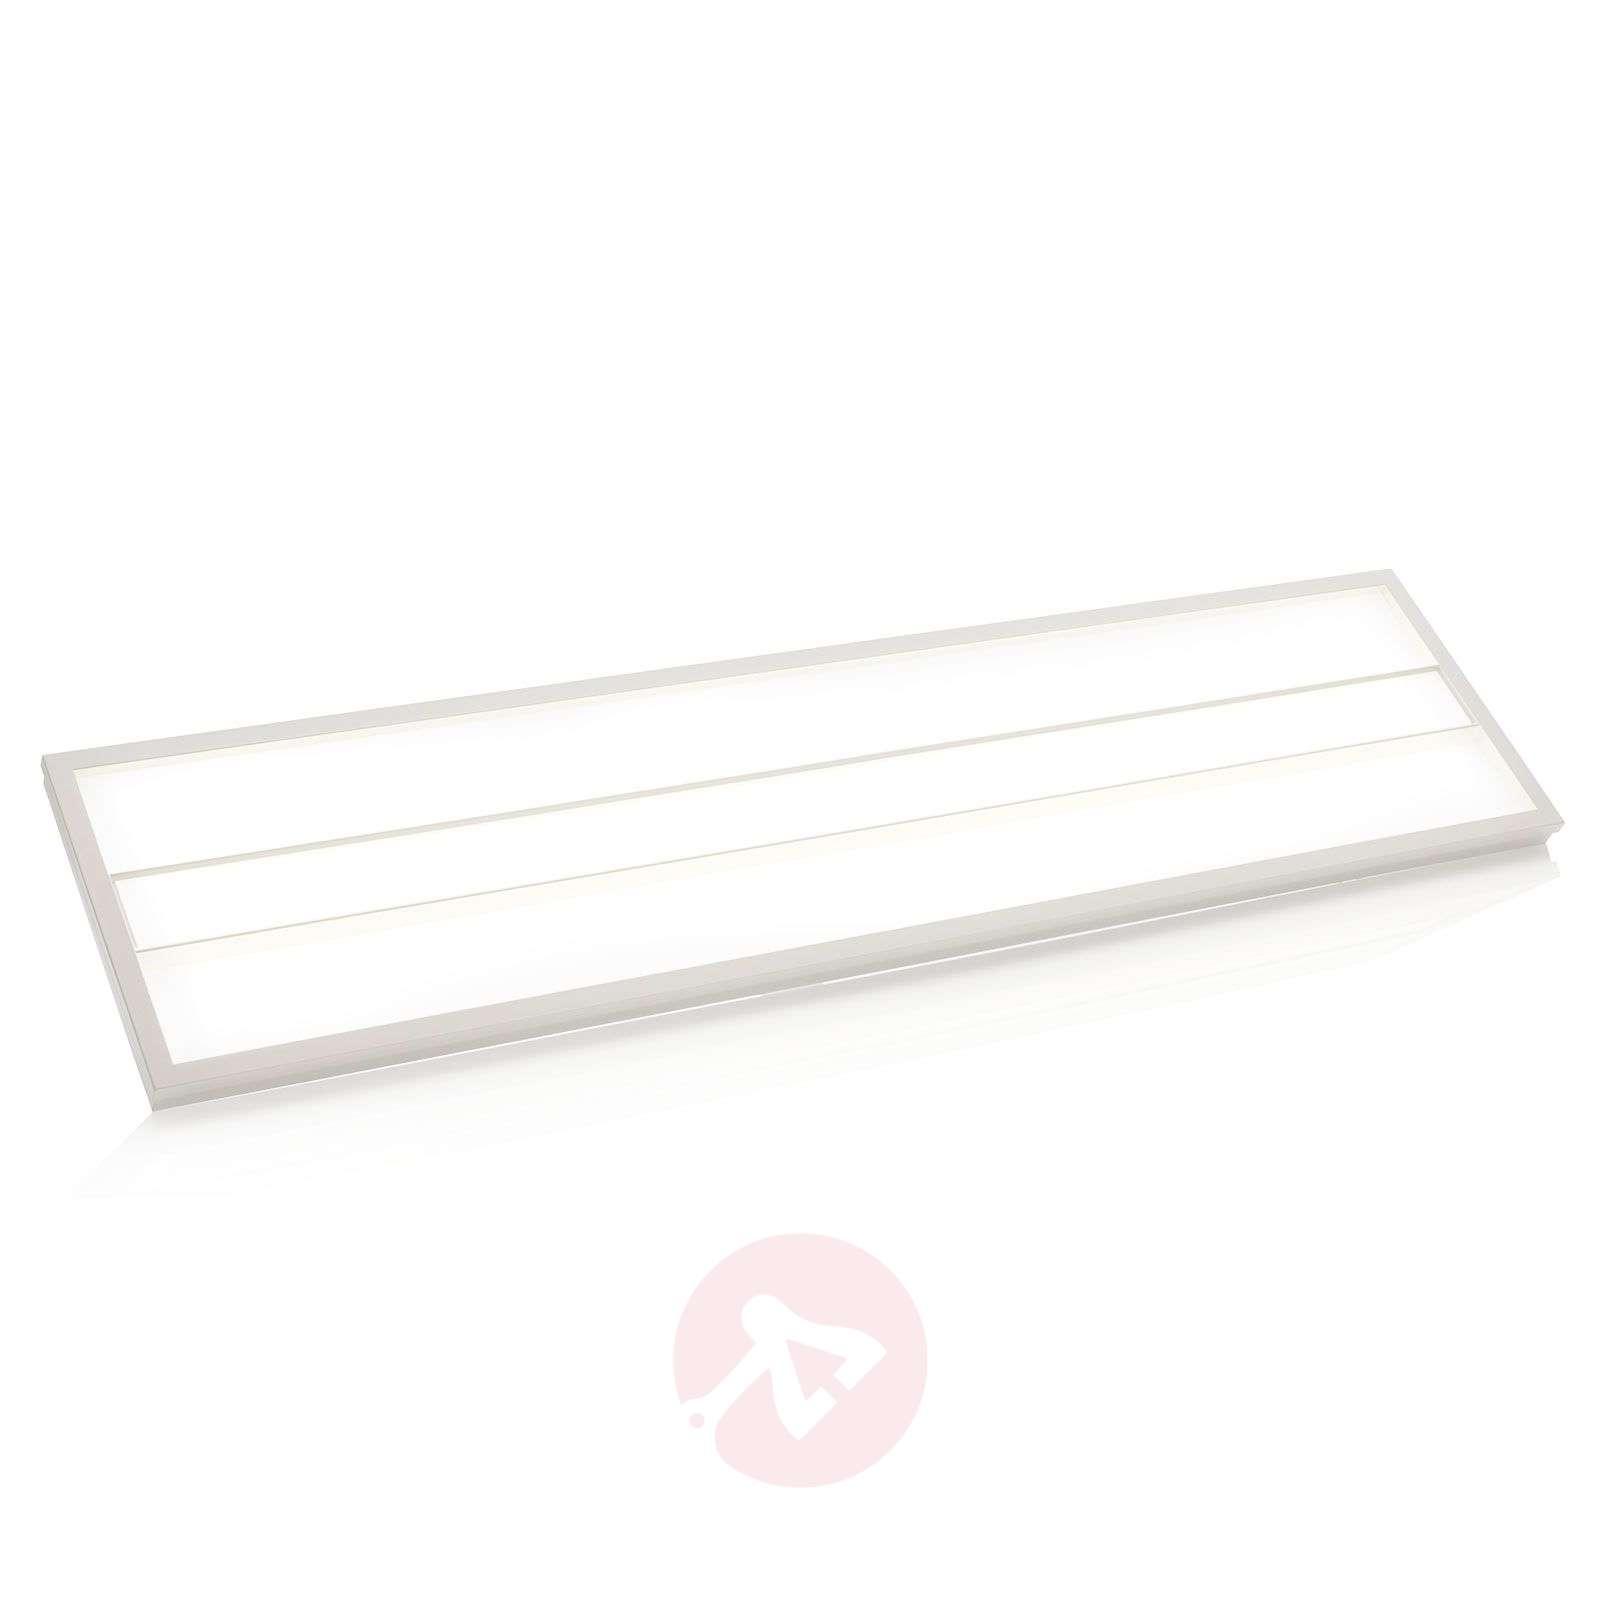 Malo LED panel for louvre ceilings, 30 cm x 120 cm-9978082-02